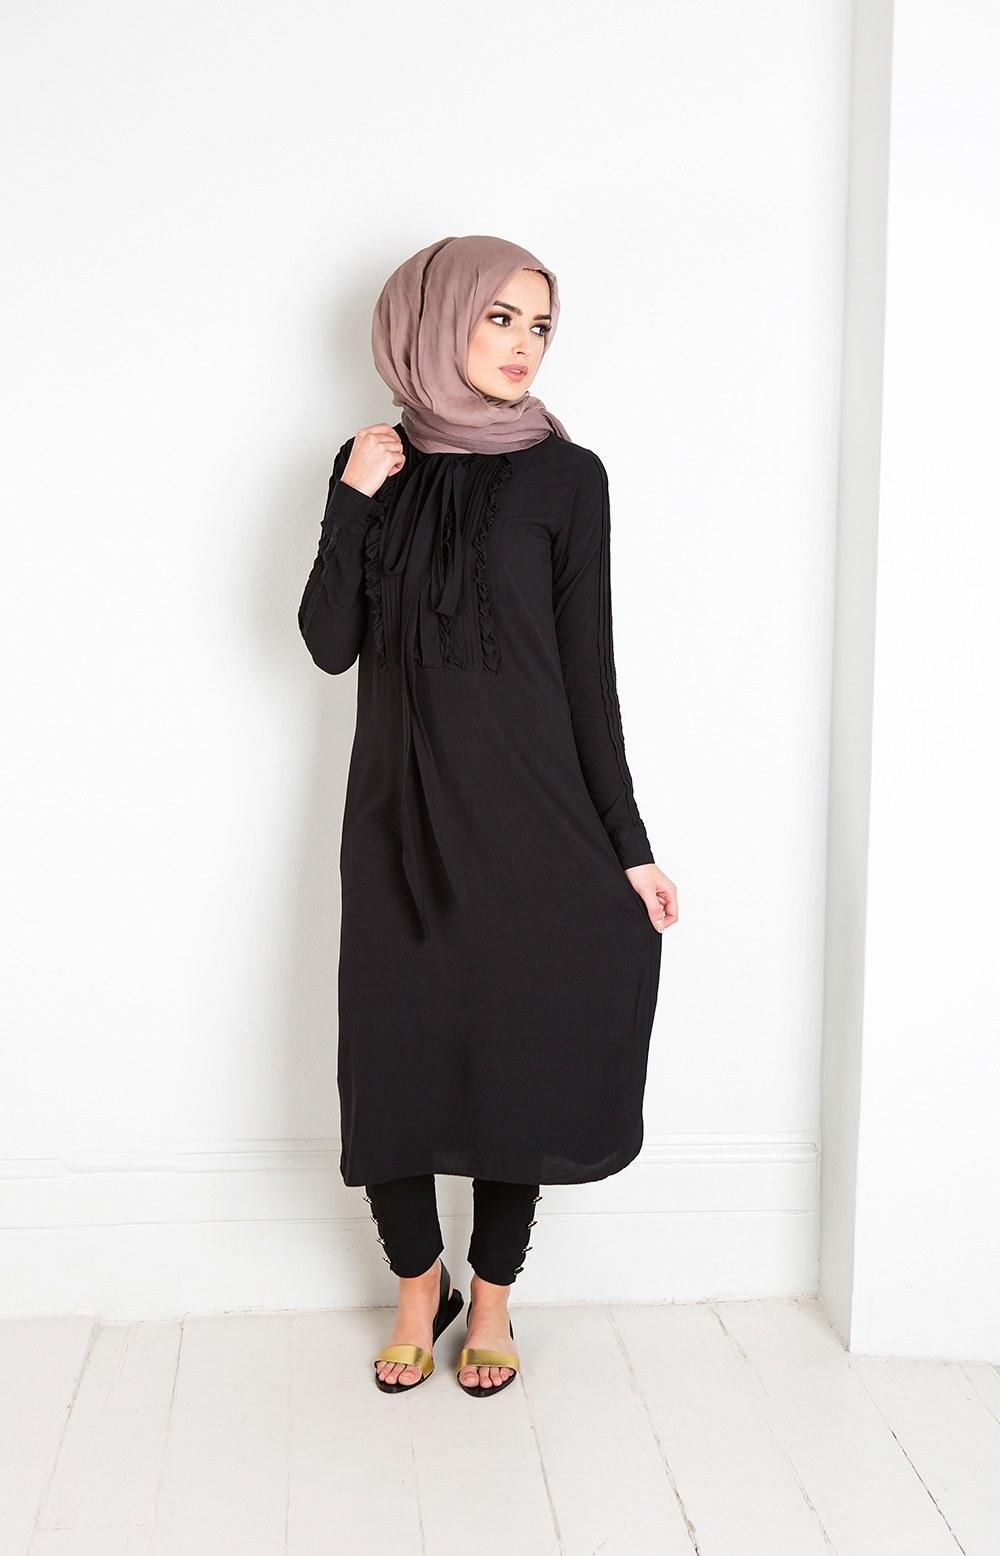 Bentuk Model Baju Lebaran Wanita 3id6 25 Trend Model Baju Muslim Lebaran 2018 Simple & Modis